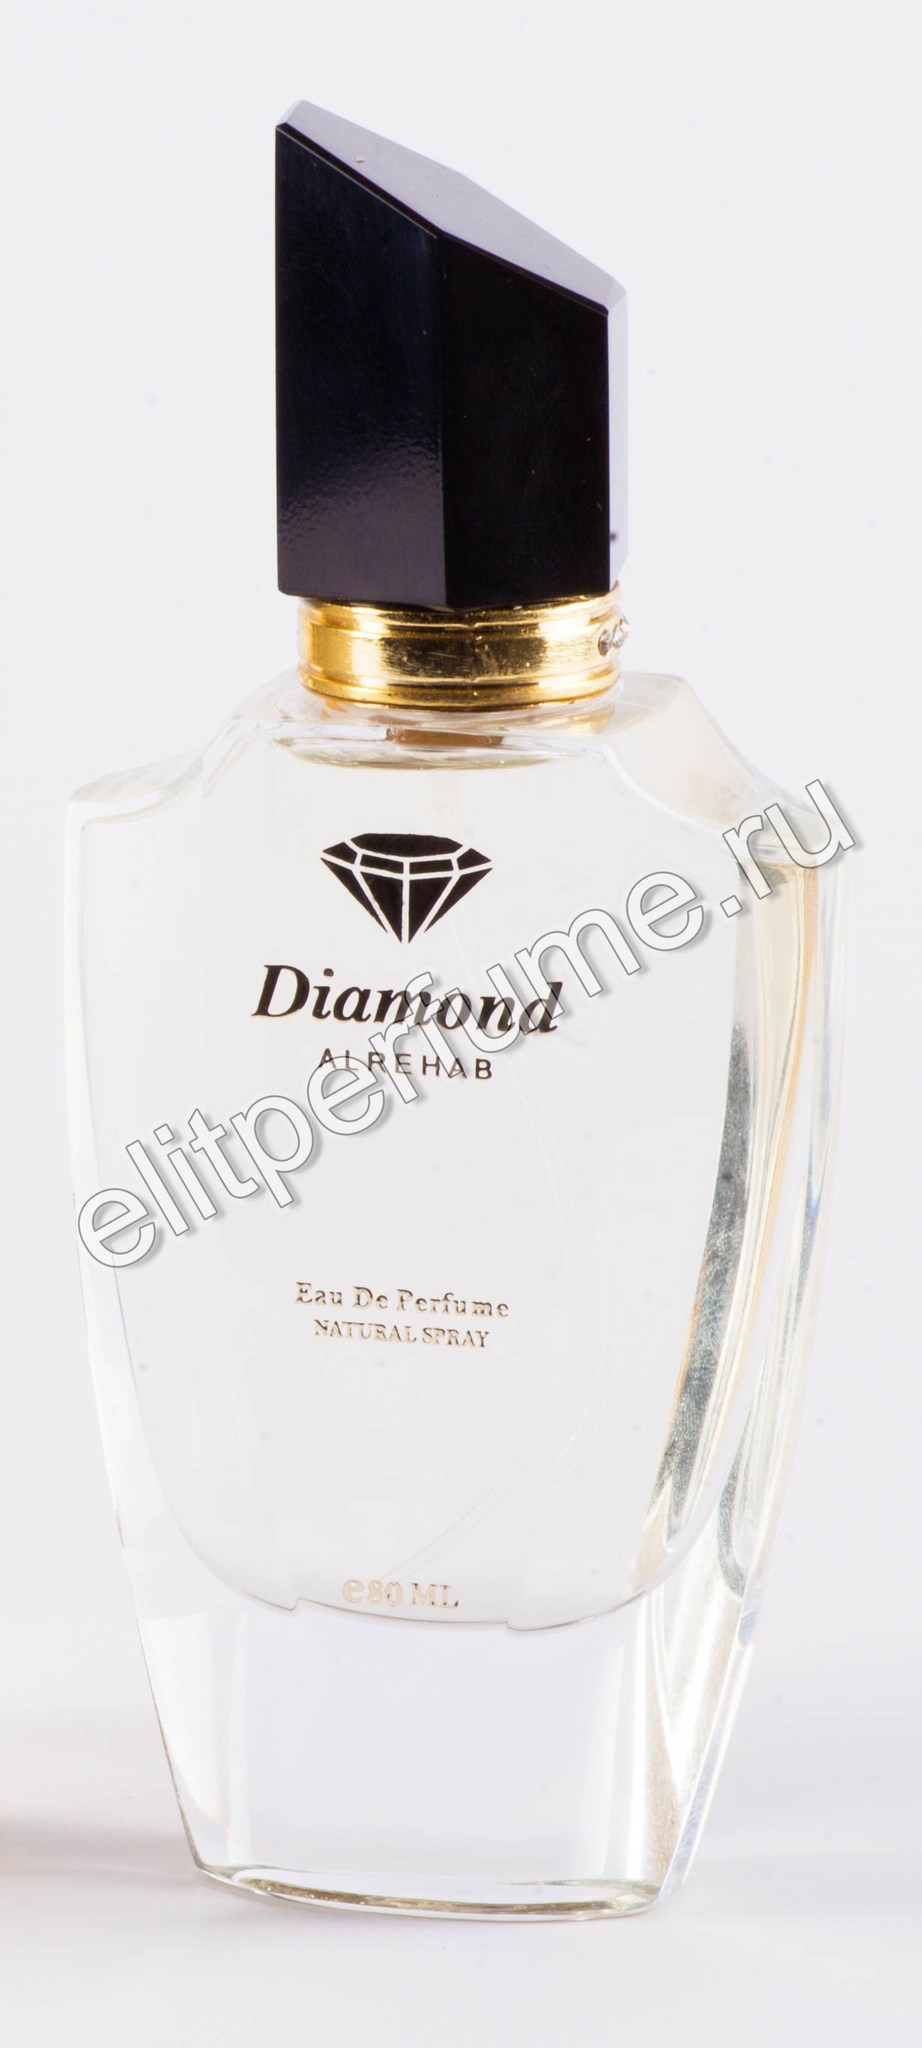 Diamond Даймонд 80 мл спрей от Аль Рехаб Al Rehab